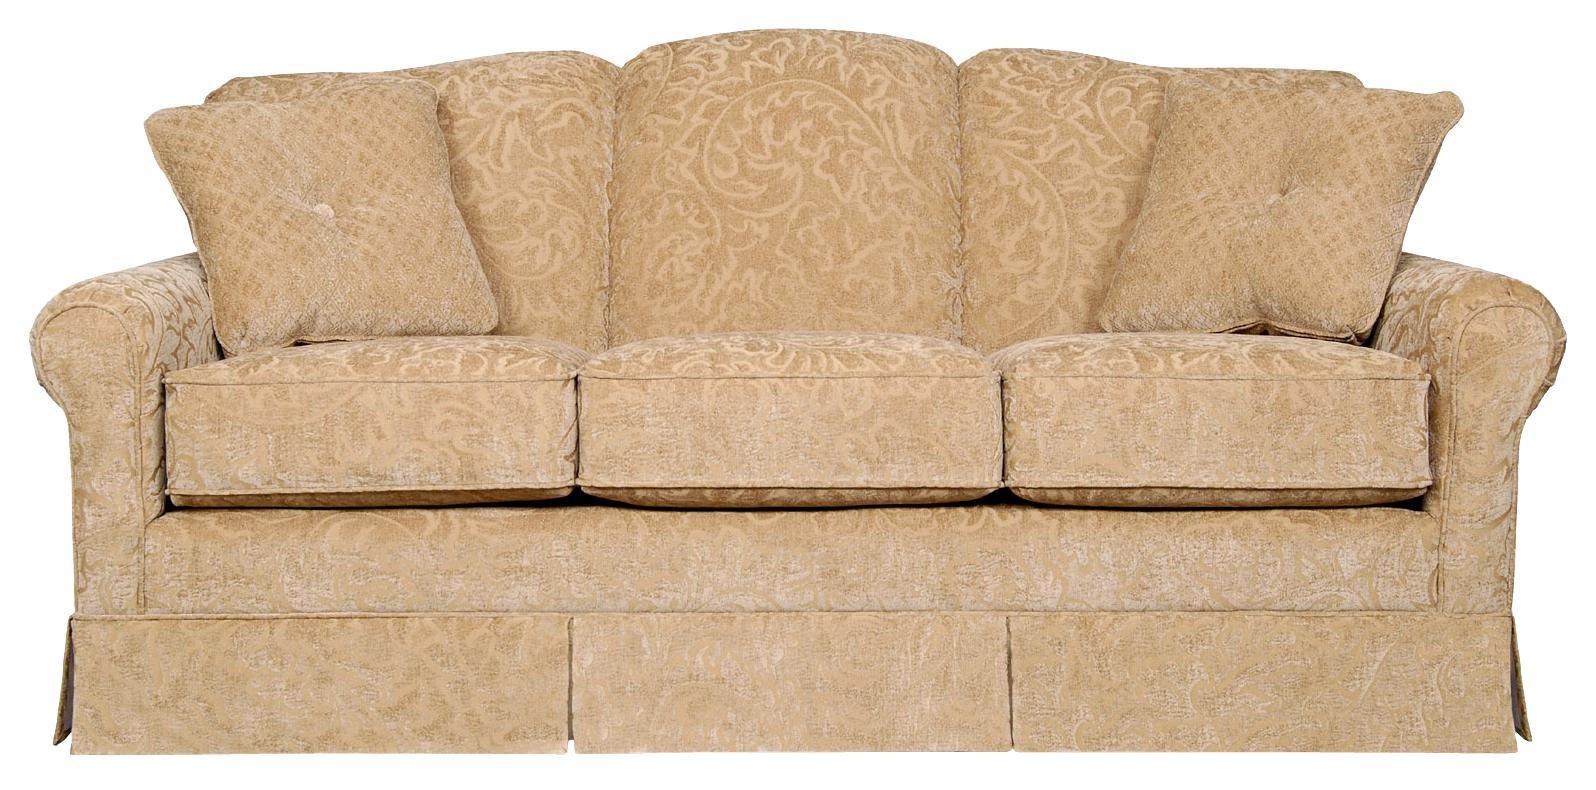 England Charleston Sofa - Item Number: 3105